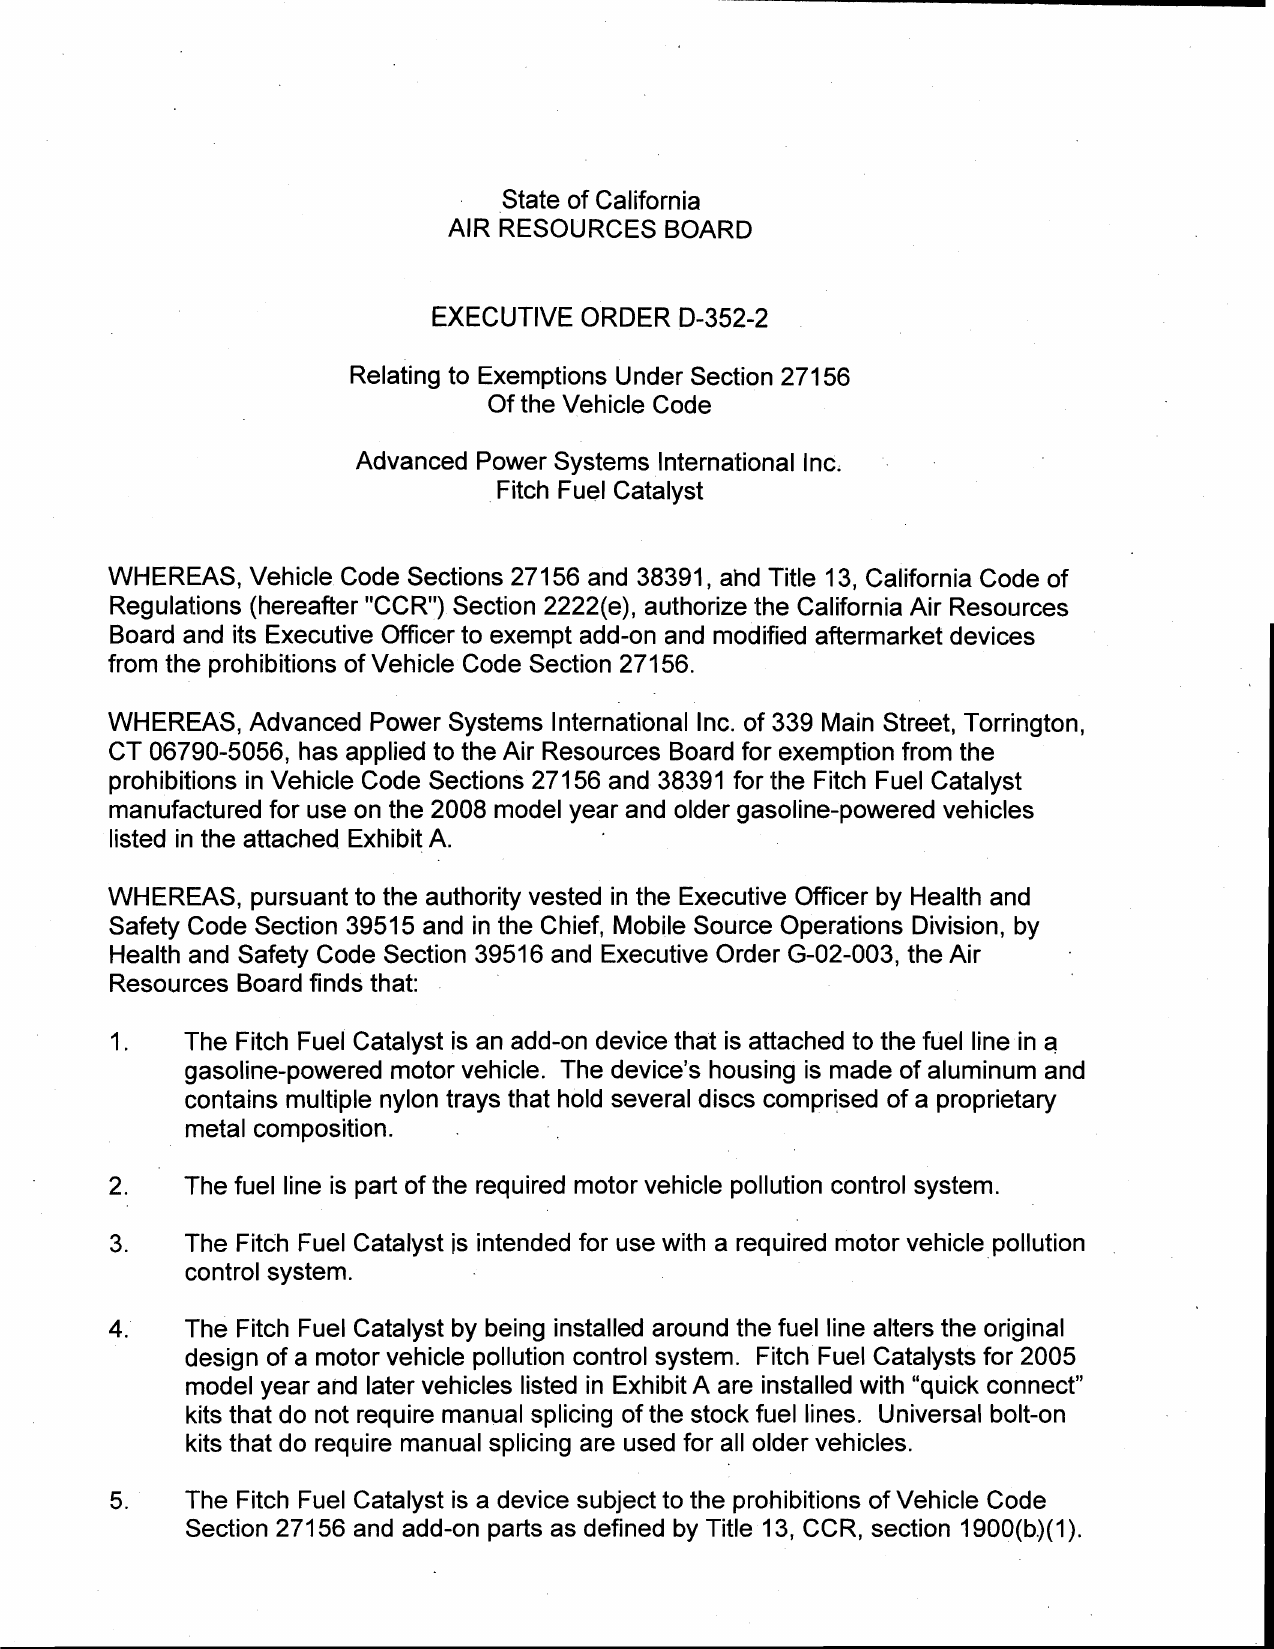 Executive Order D 352 2 Advanced Power Systems International Inc